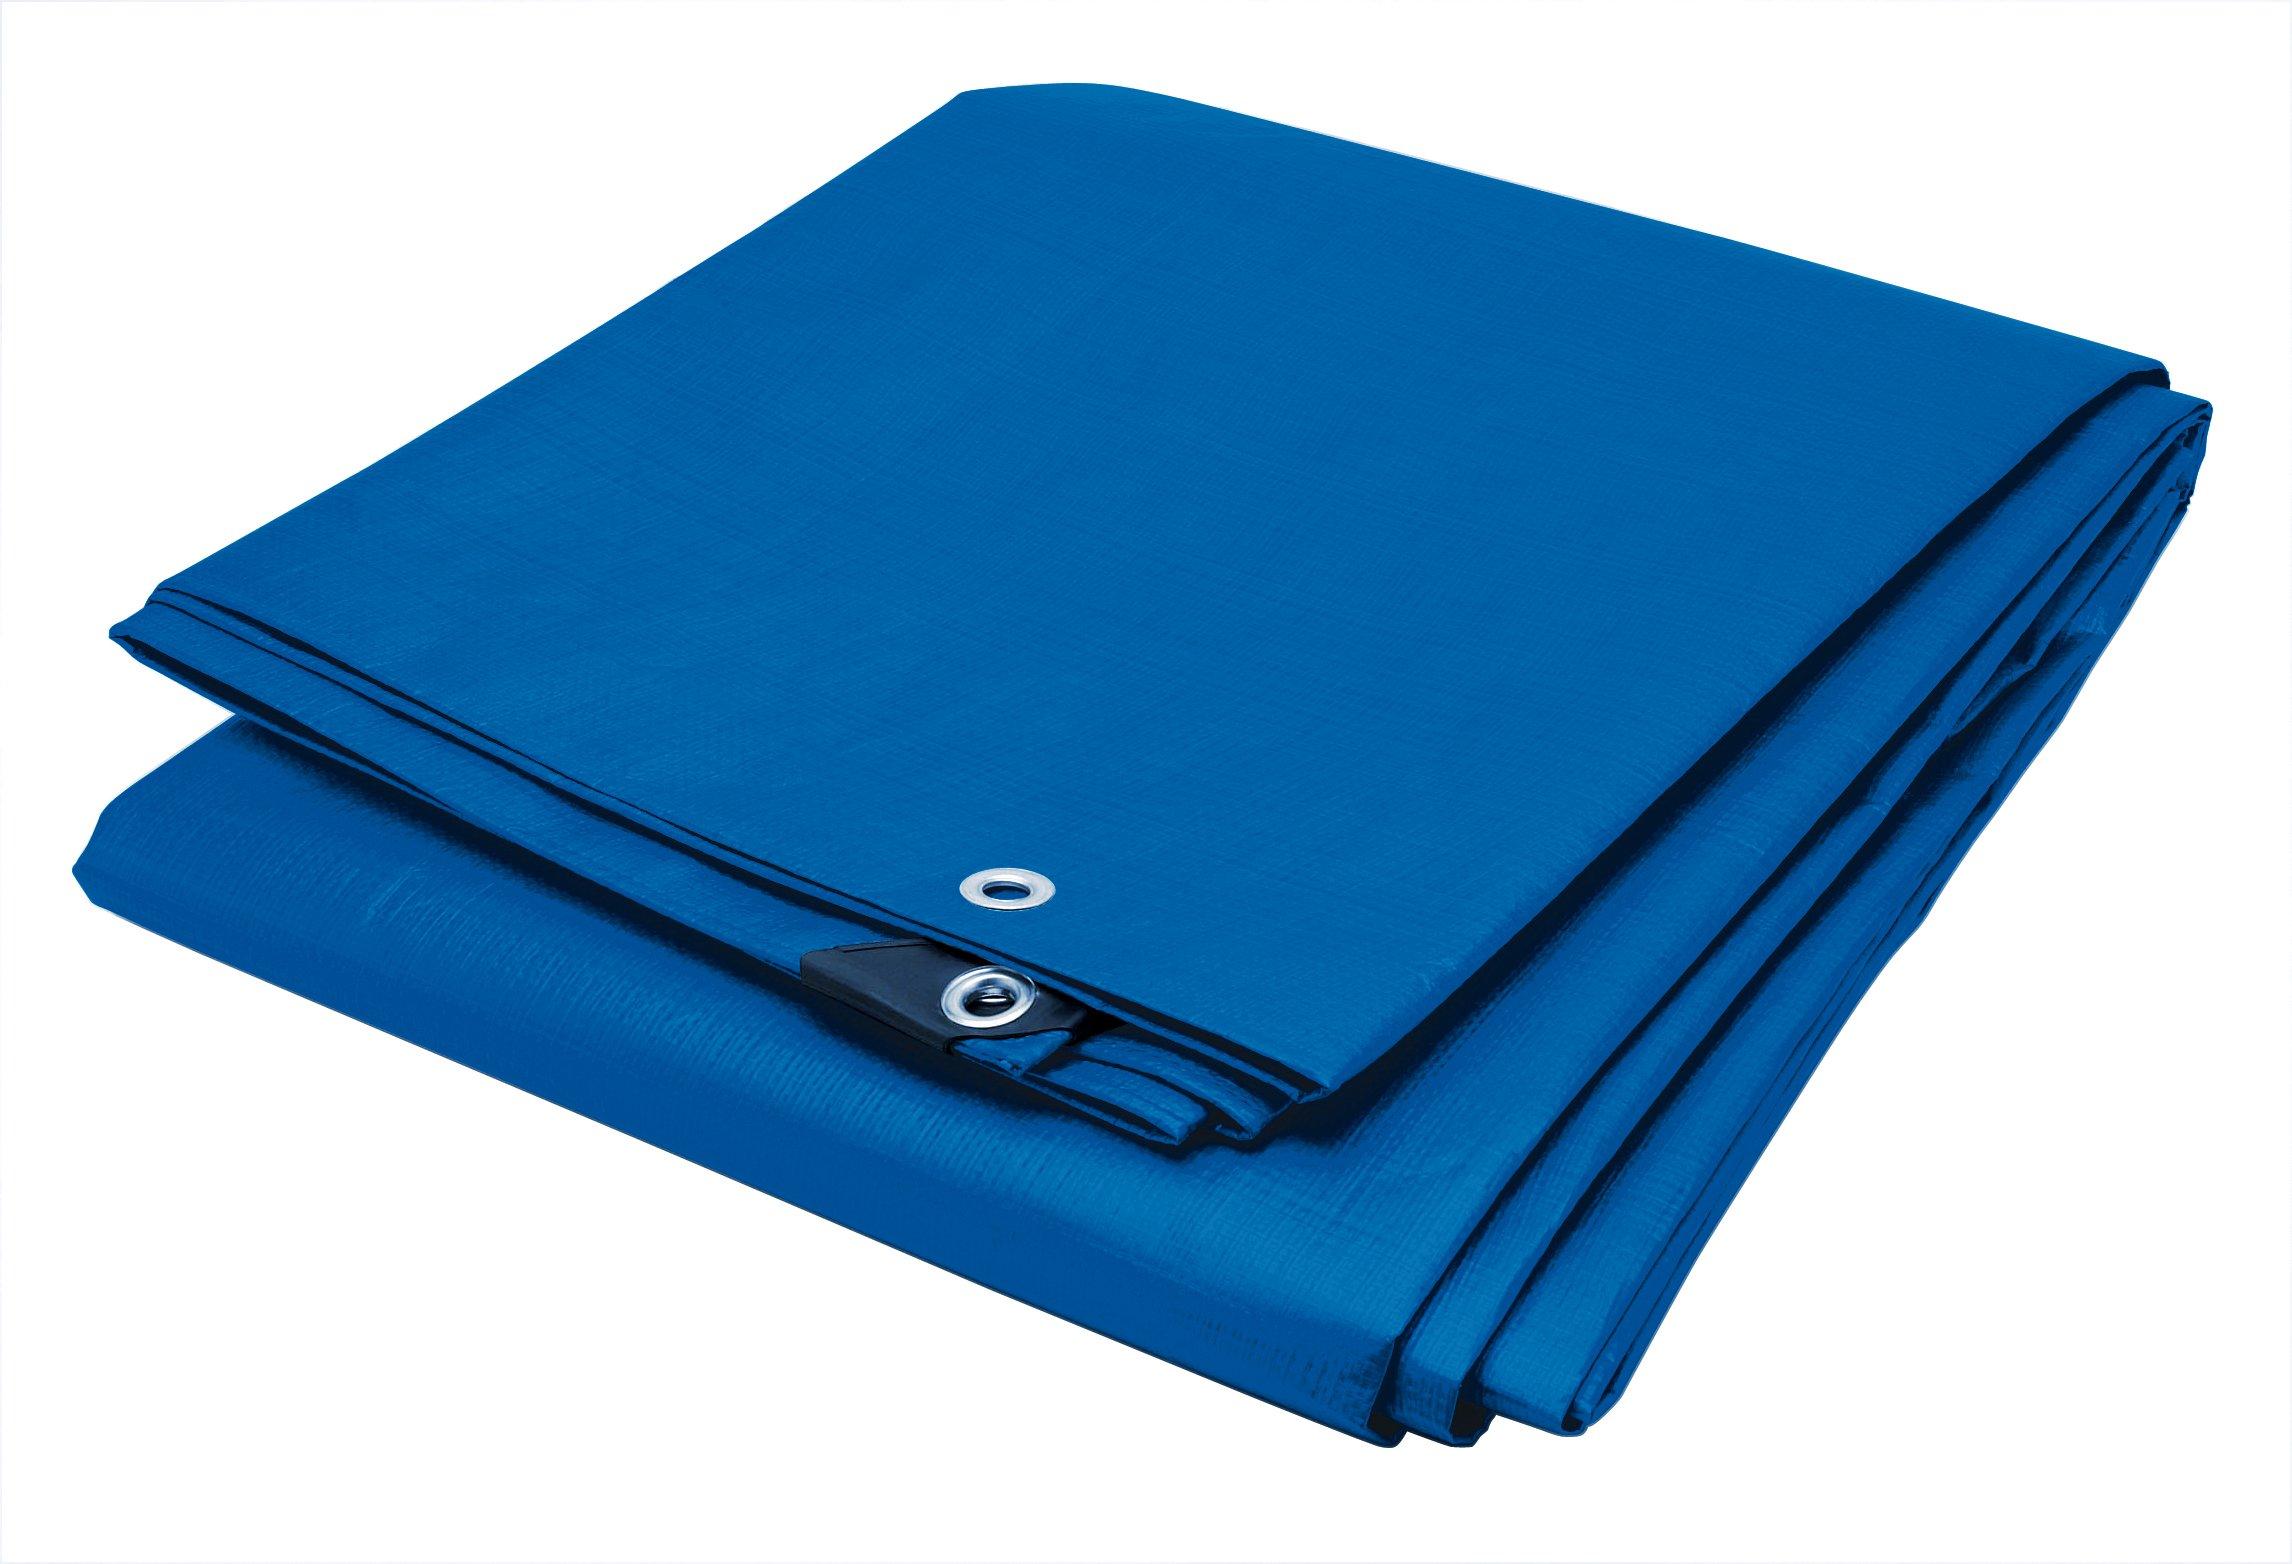 Performance Tool W6009 Reinforced Water Resistant Multi Purpose Blue Tarp, 4mil, 10-Feet x 20-Feet